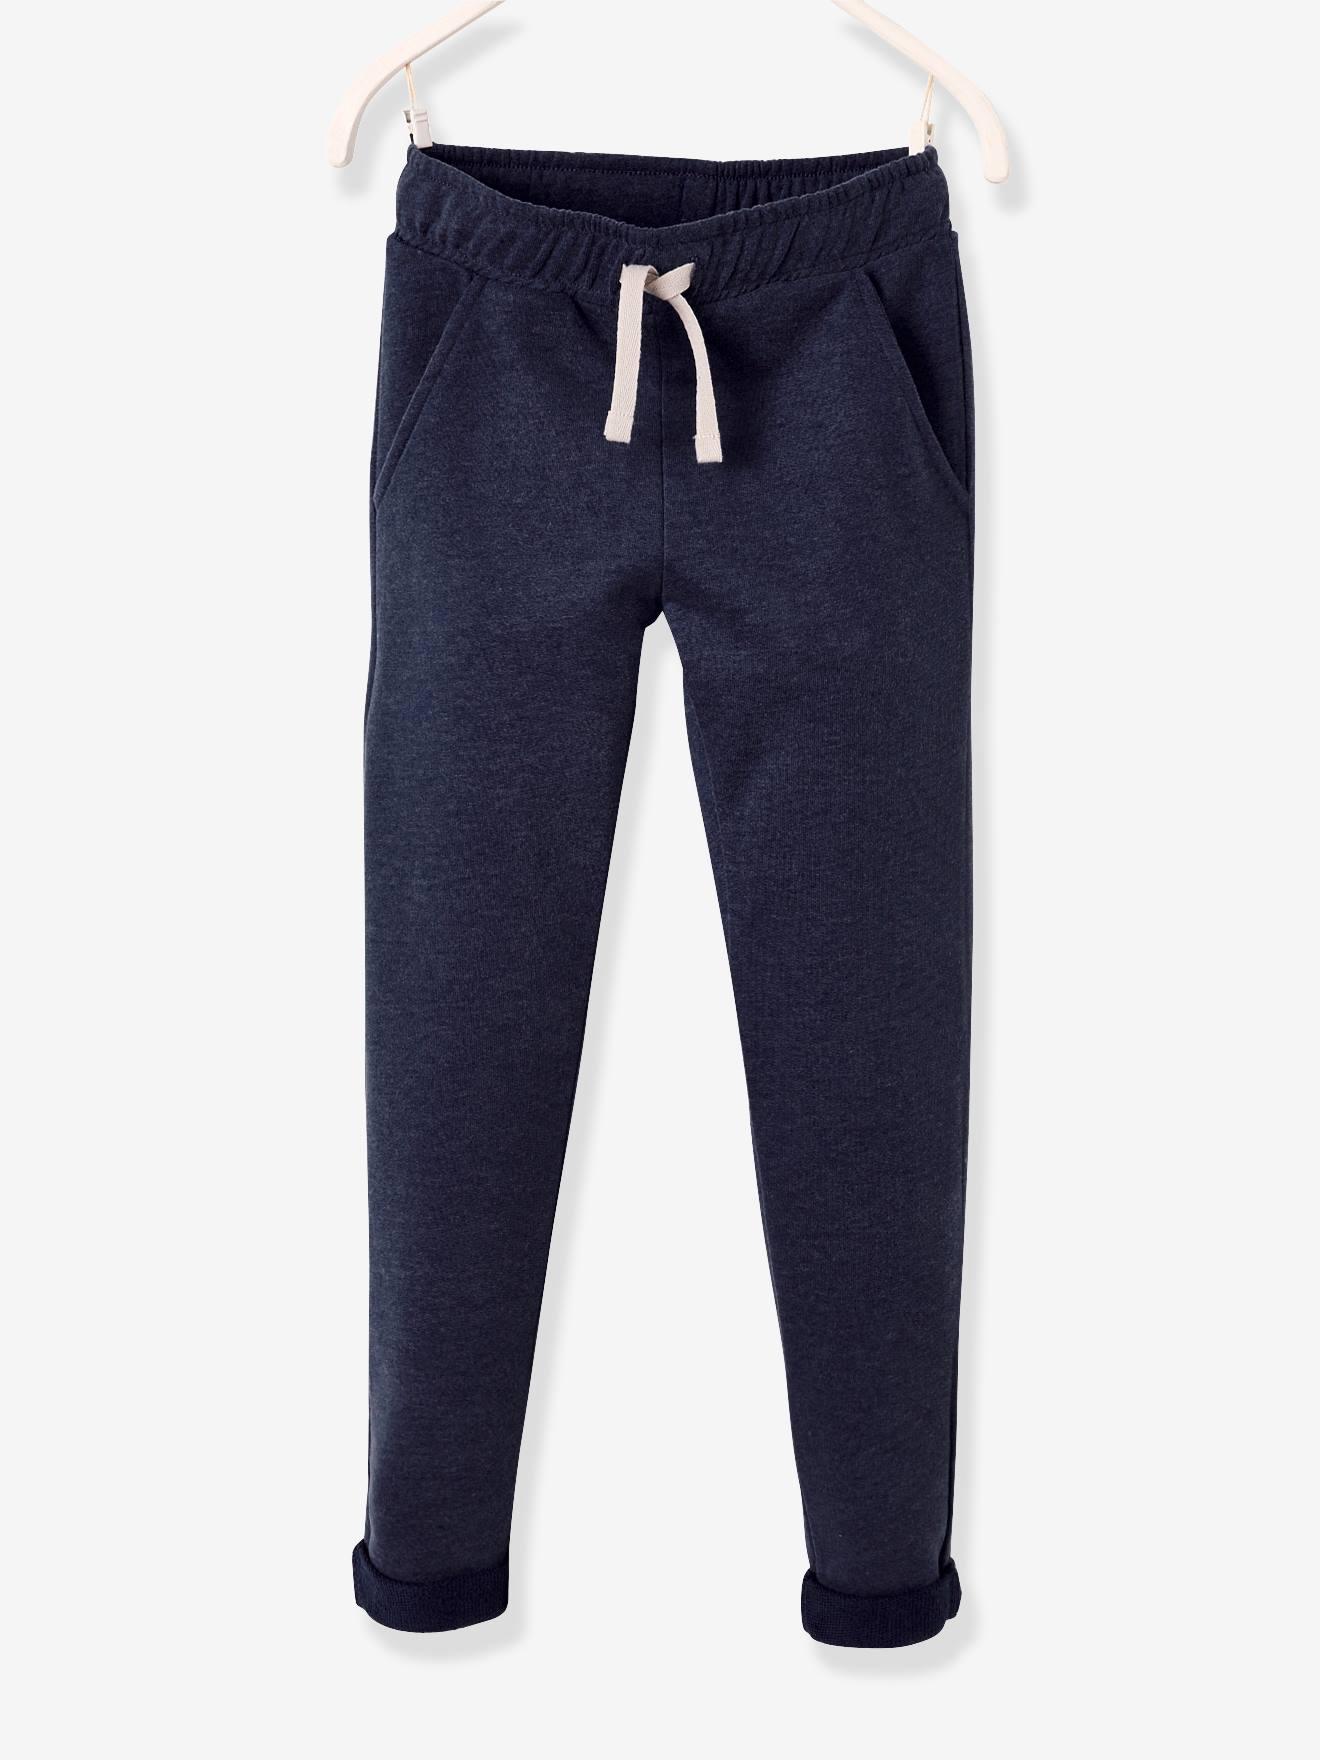 Pantalon garçon en molleton marine chiné